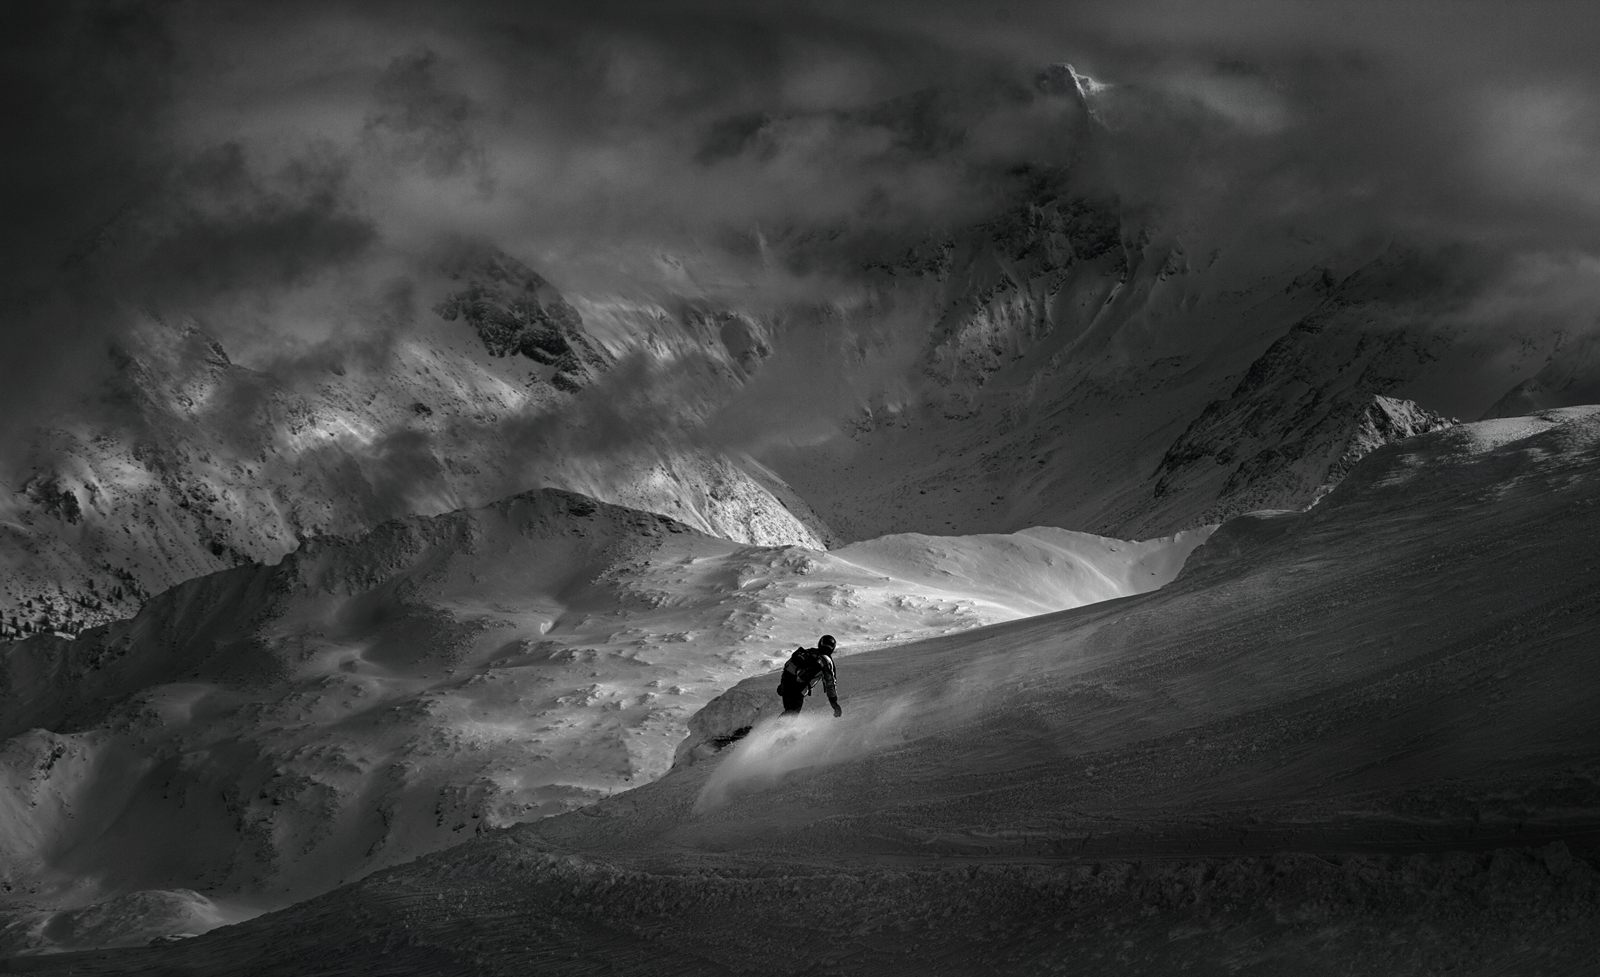 Alter-View_Photography_Showcase_Peter_Svoboda_2.jpeg